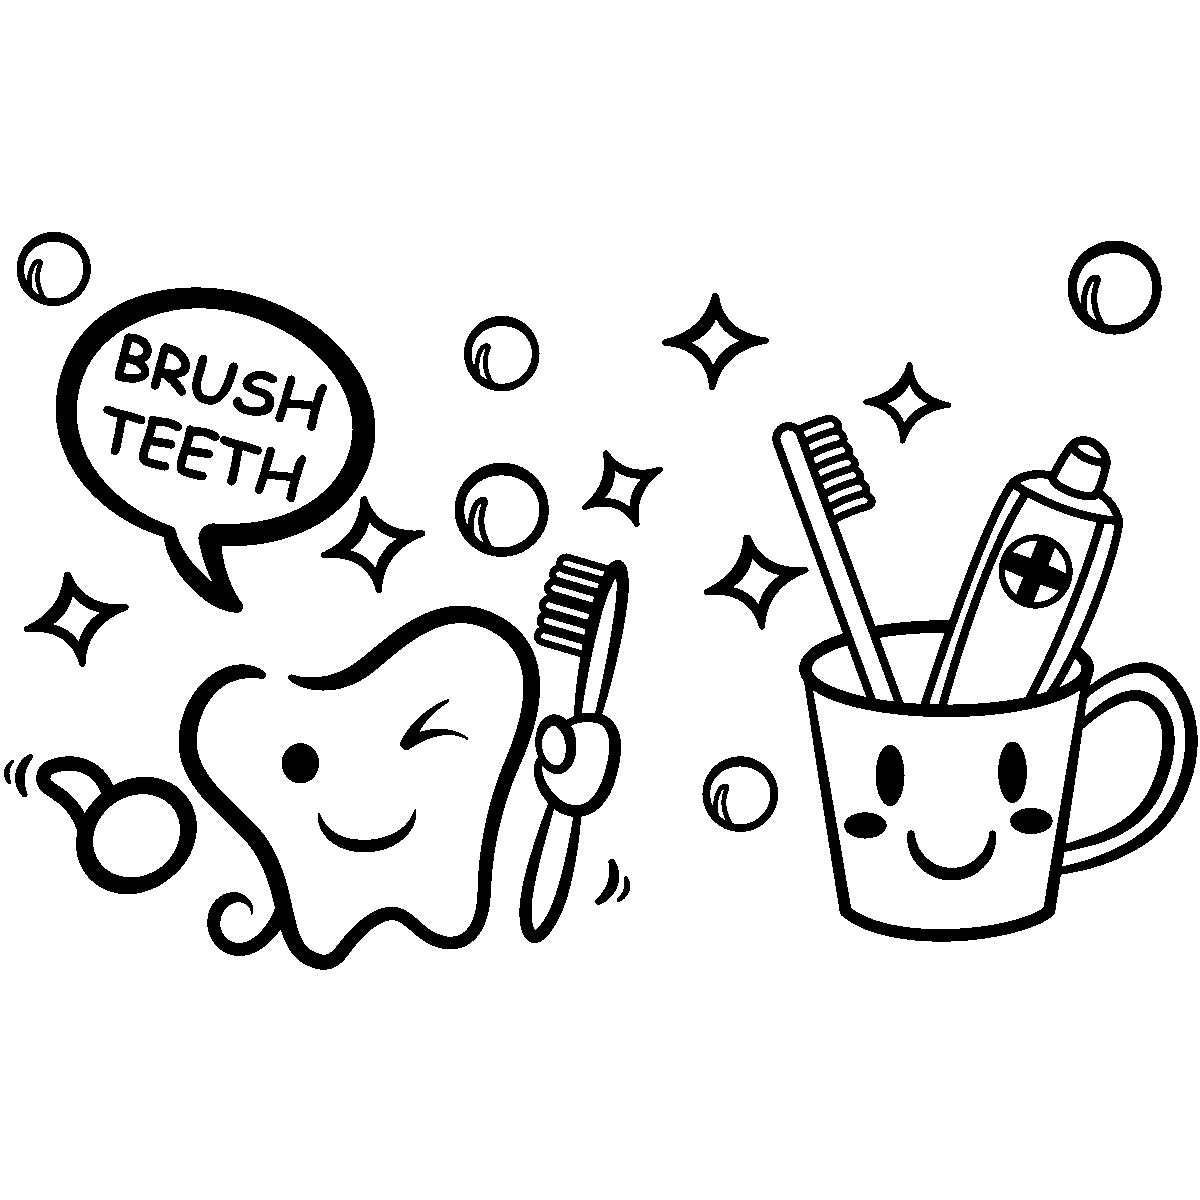 Salle De Bain Style Urbain ~ Sticker Salle De Bain Citation Brush Teeth Stickers Salle De Bain